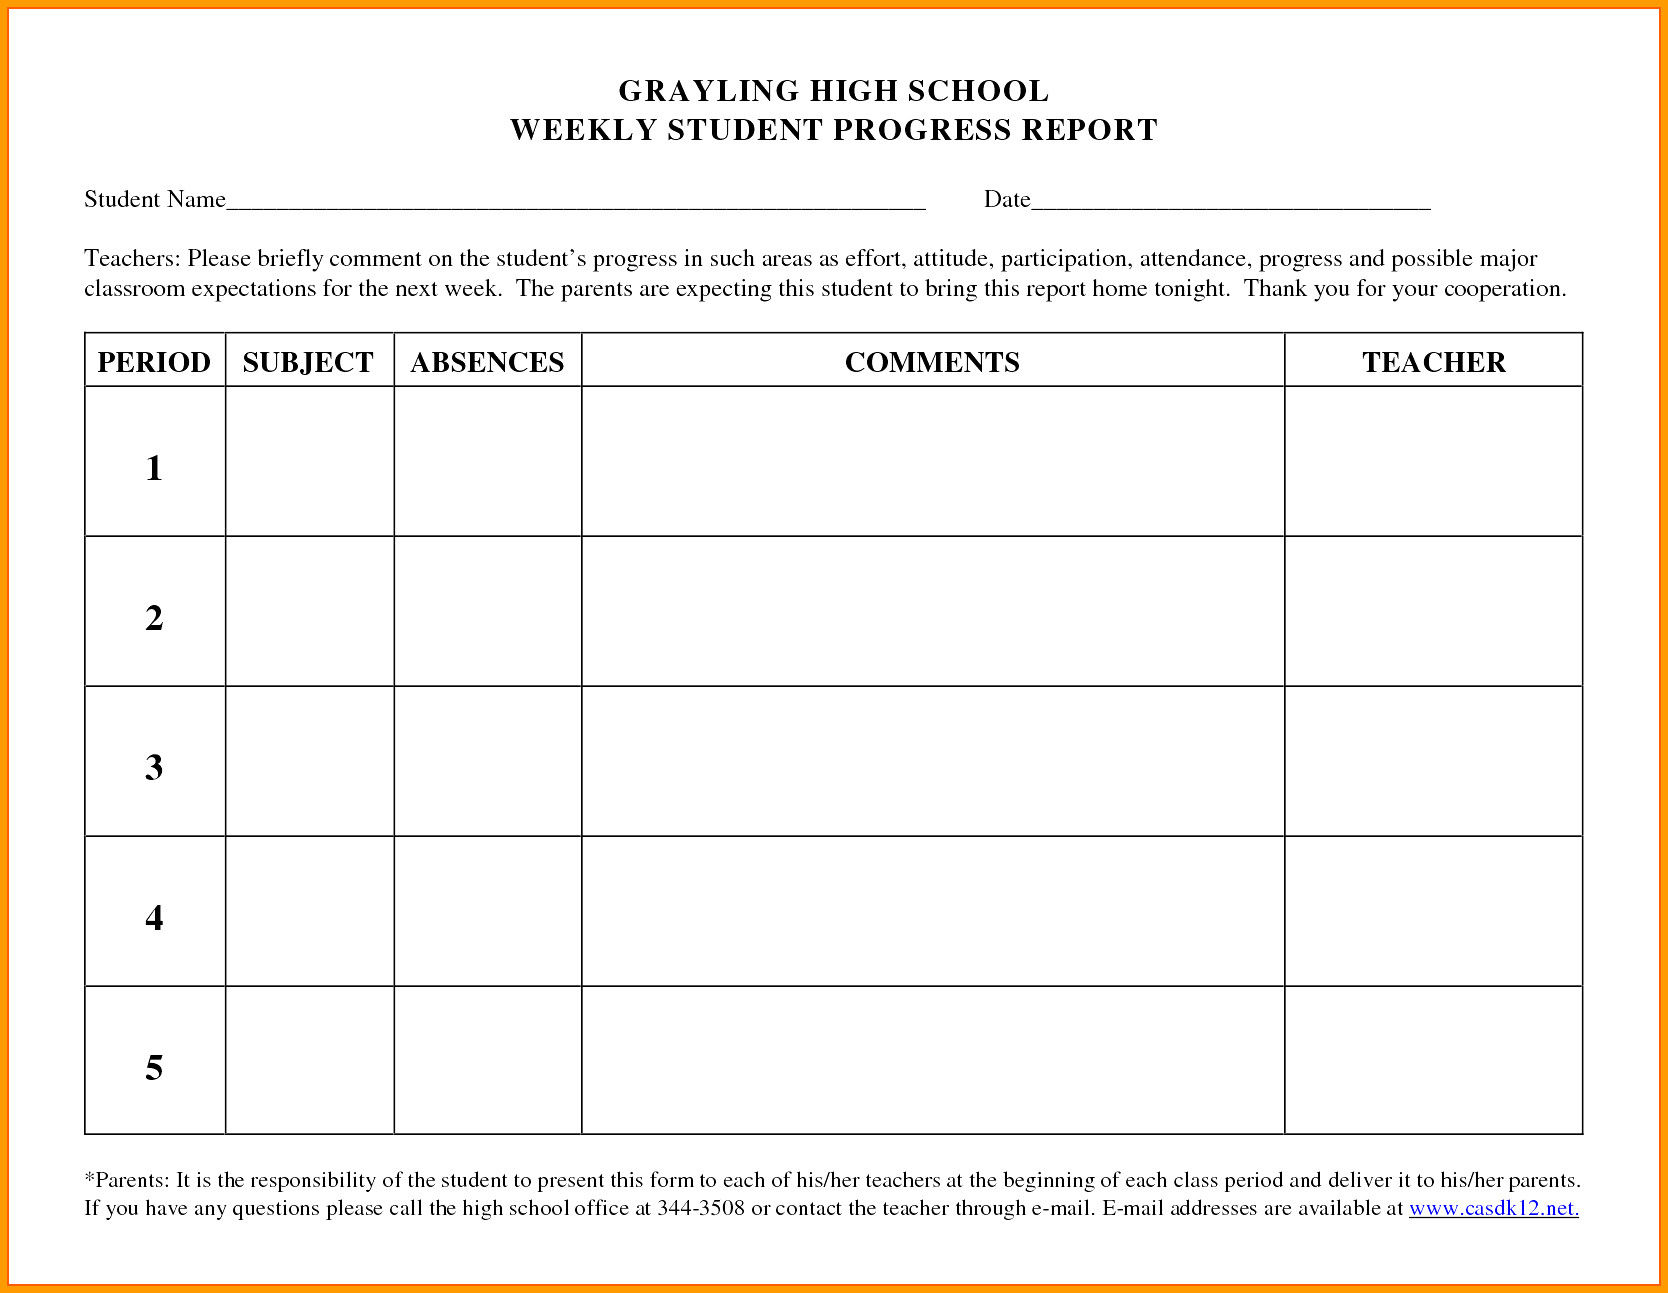 Student Progress Report Template Ideas Students Beautiful Weekly Regarding Educational Progress Report Template